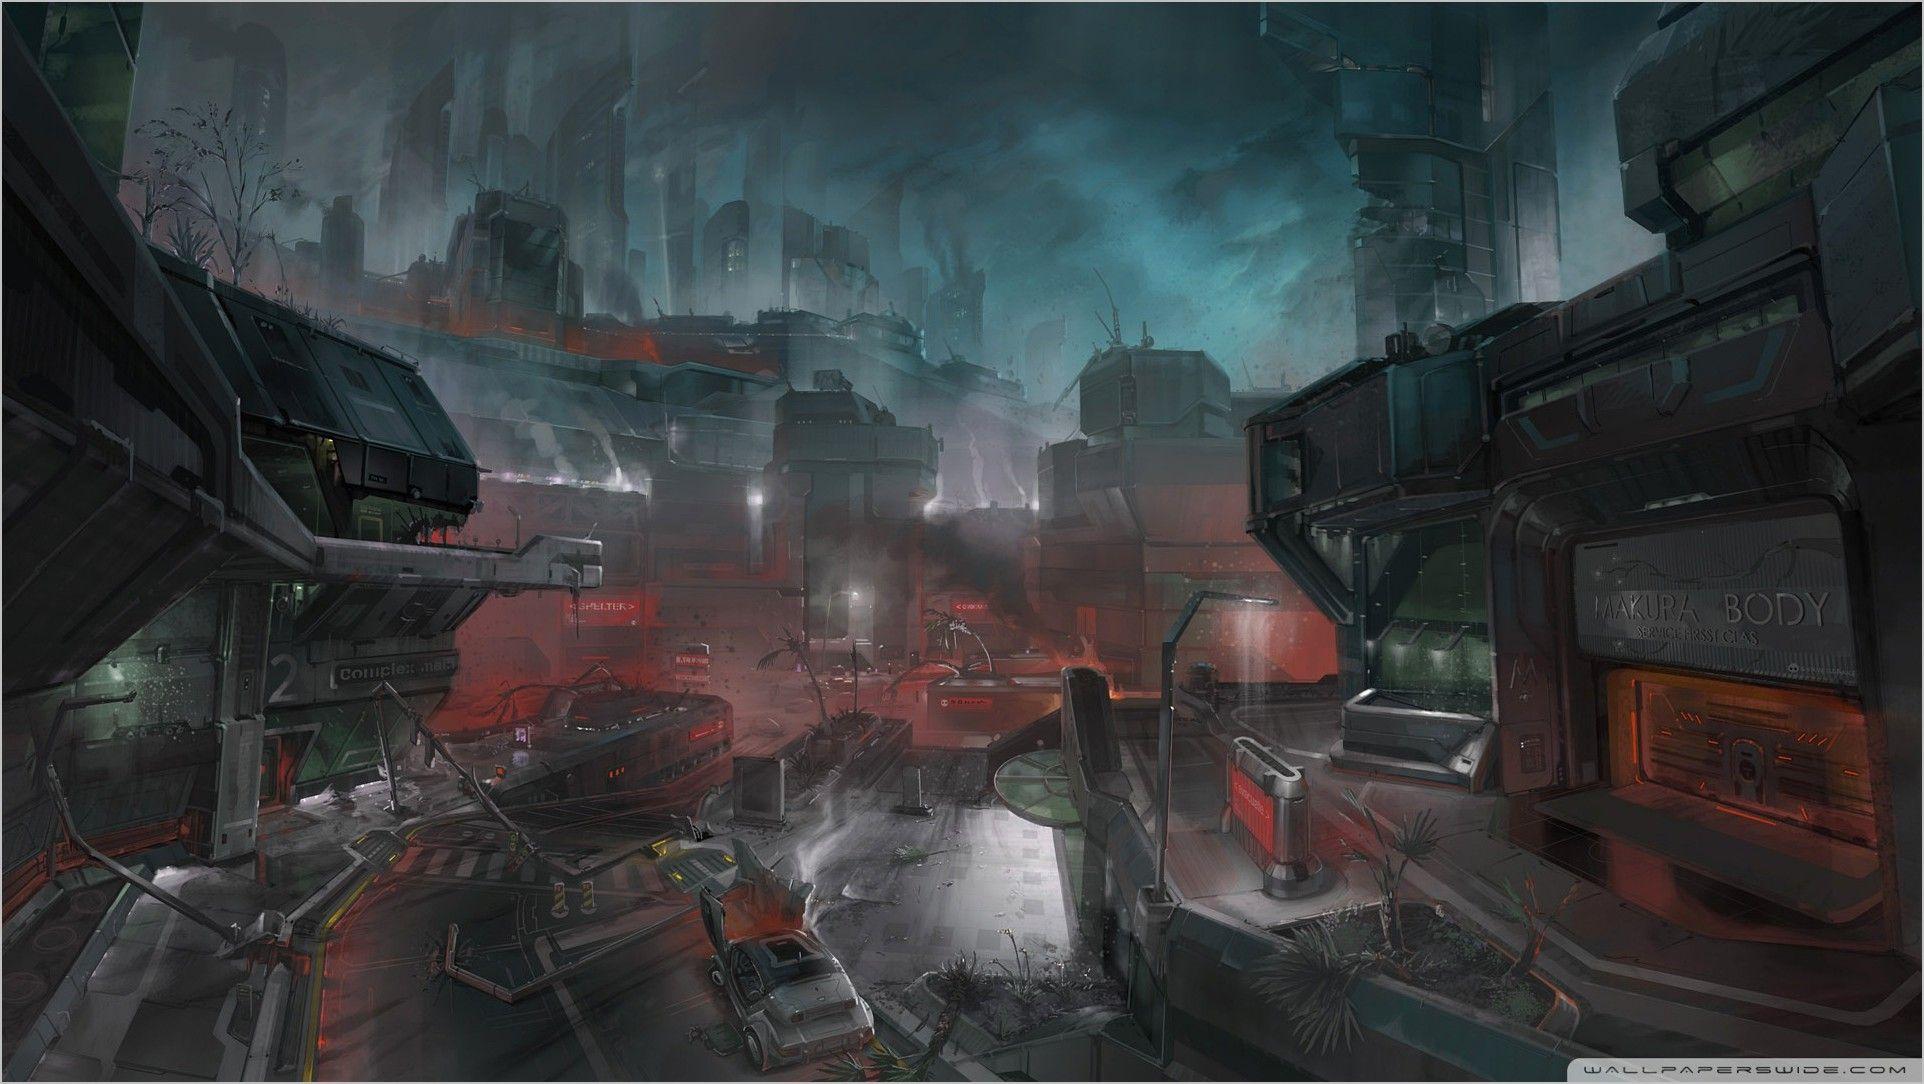 Halo Odst Wallpaper 4k In 2020 Halo 3 Odst Concept Art Art